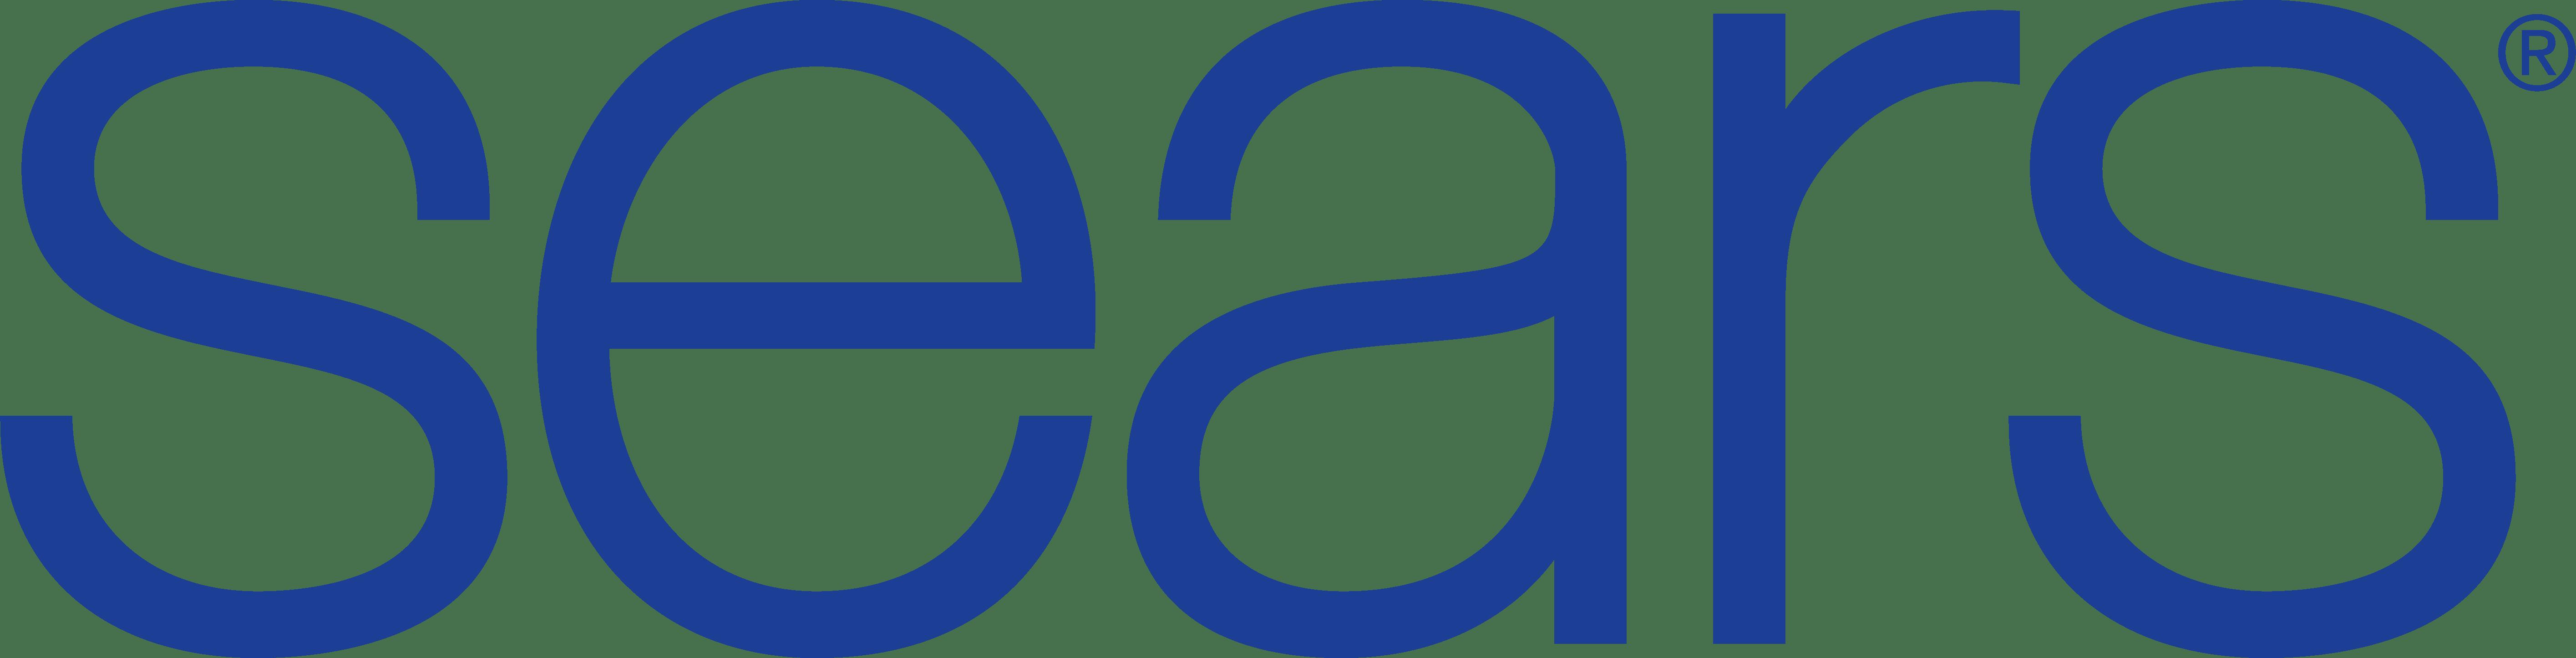 sears-logo2020.png